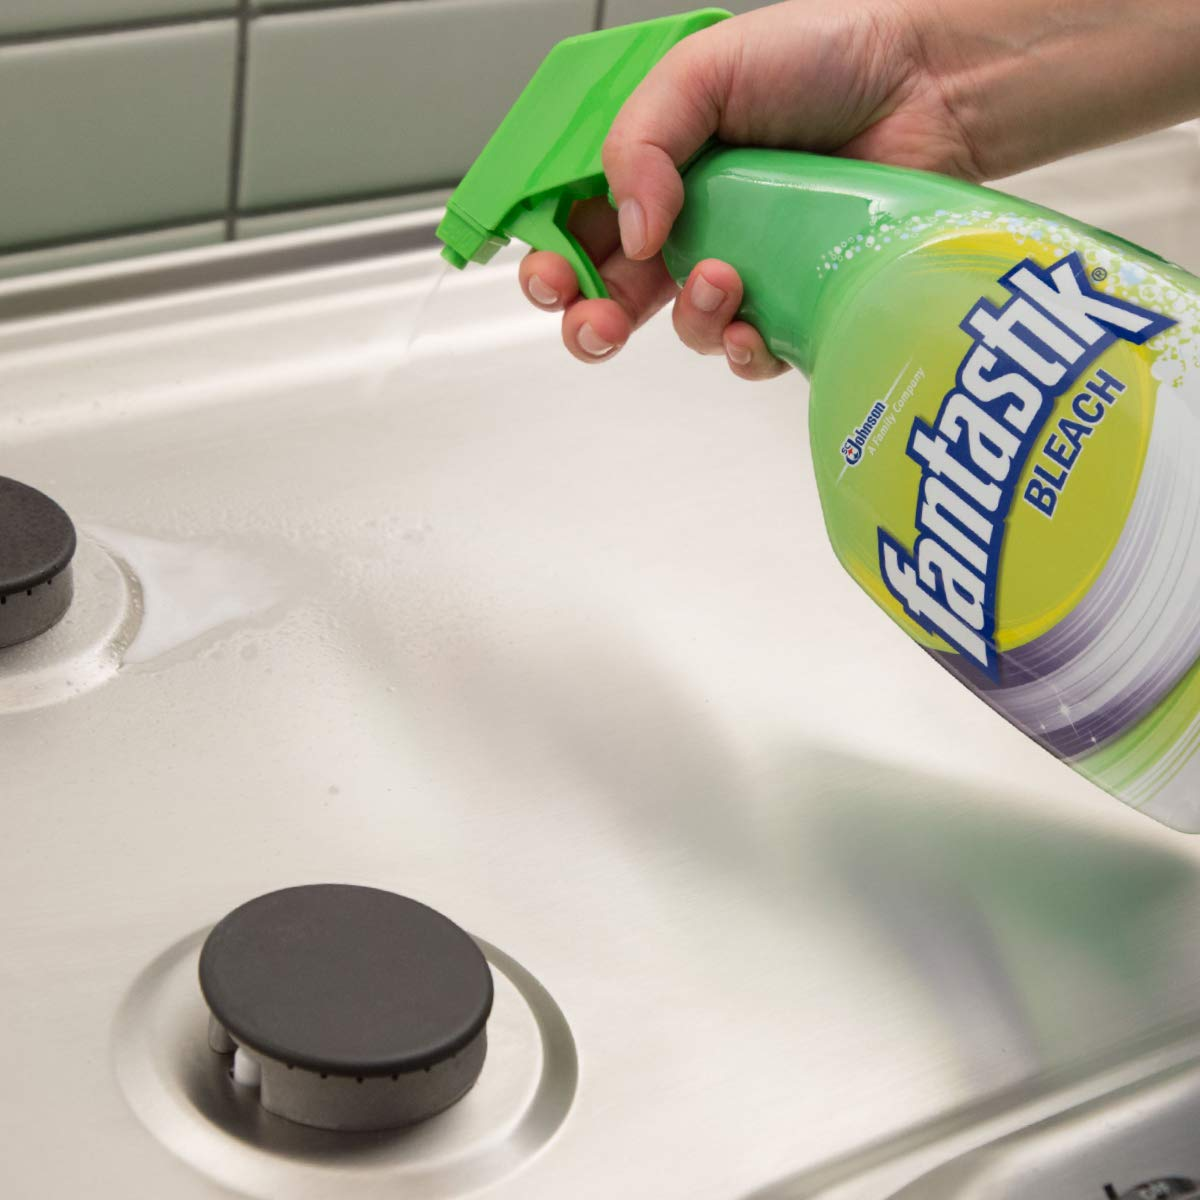 Fantastik All-Purpose Cleaner with Bleach 32 fl oz